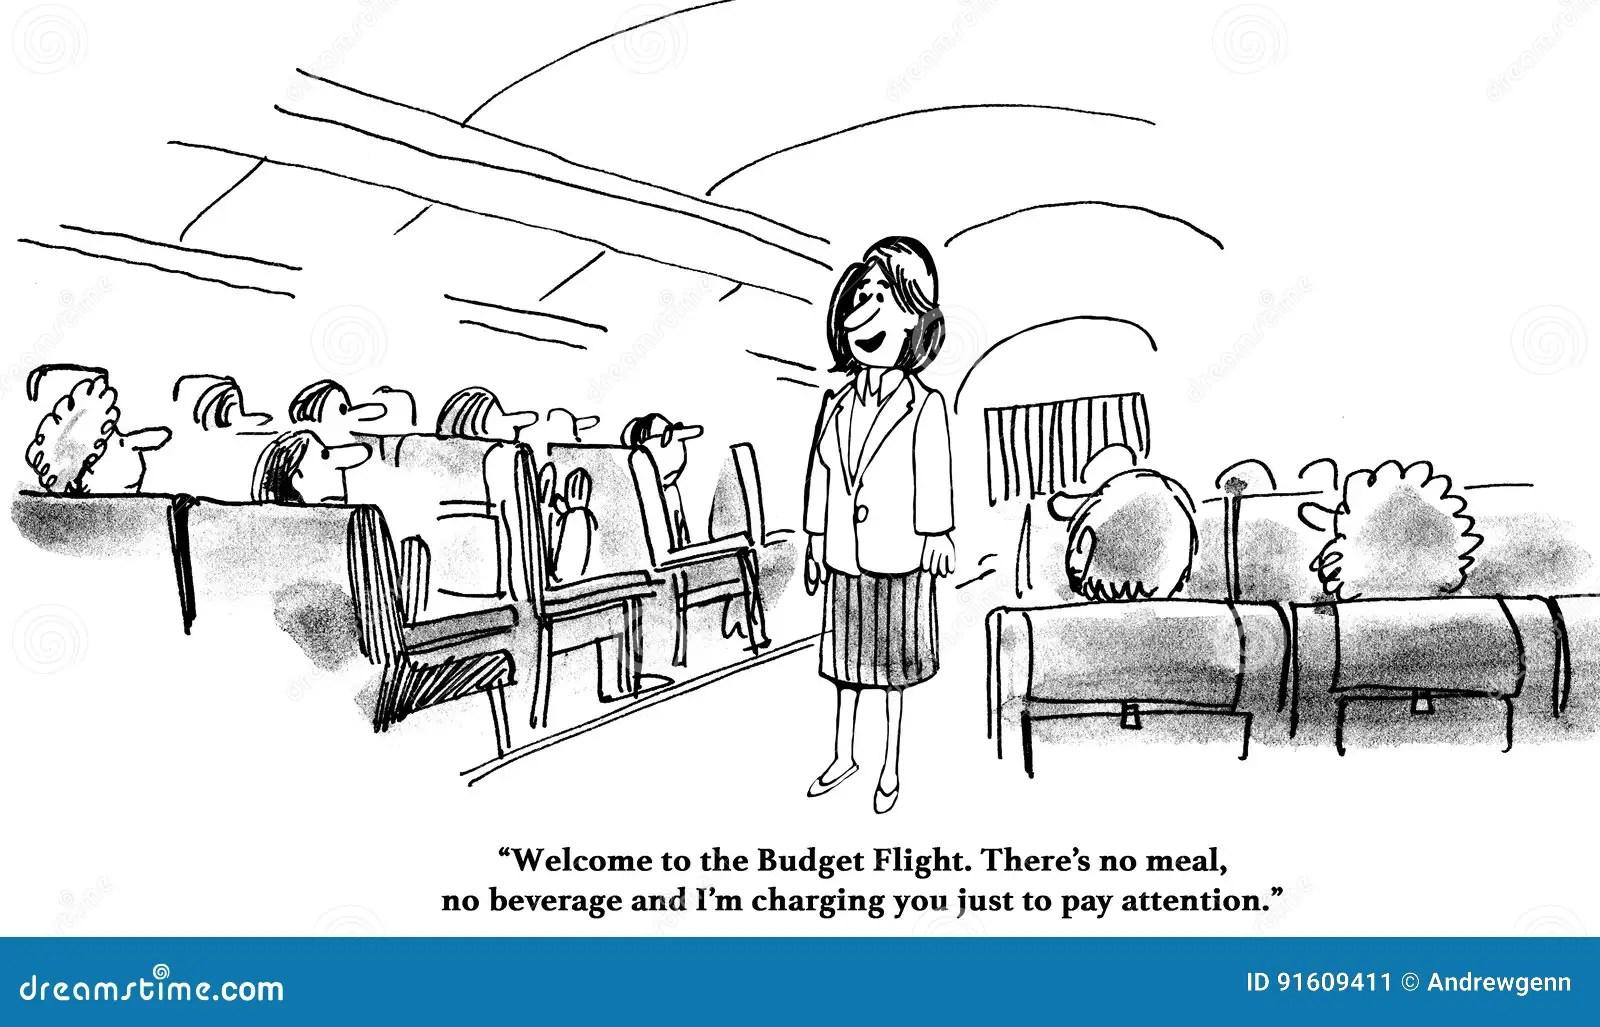 100+ Airplane Safety Illustration